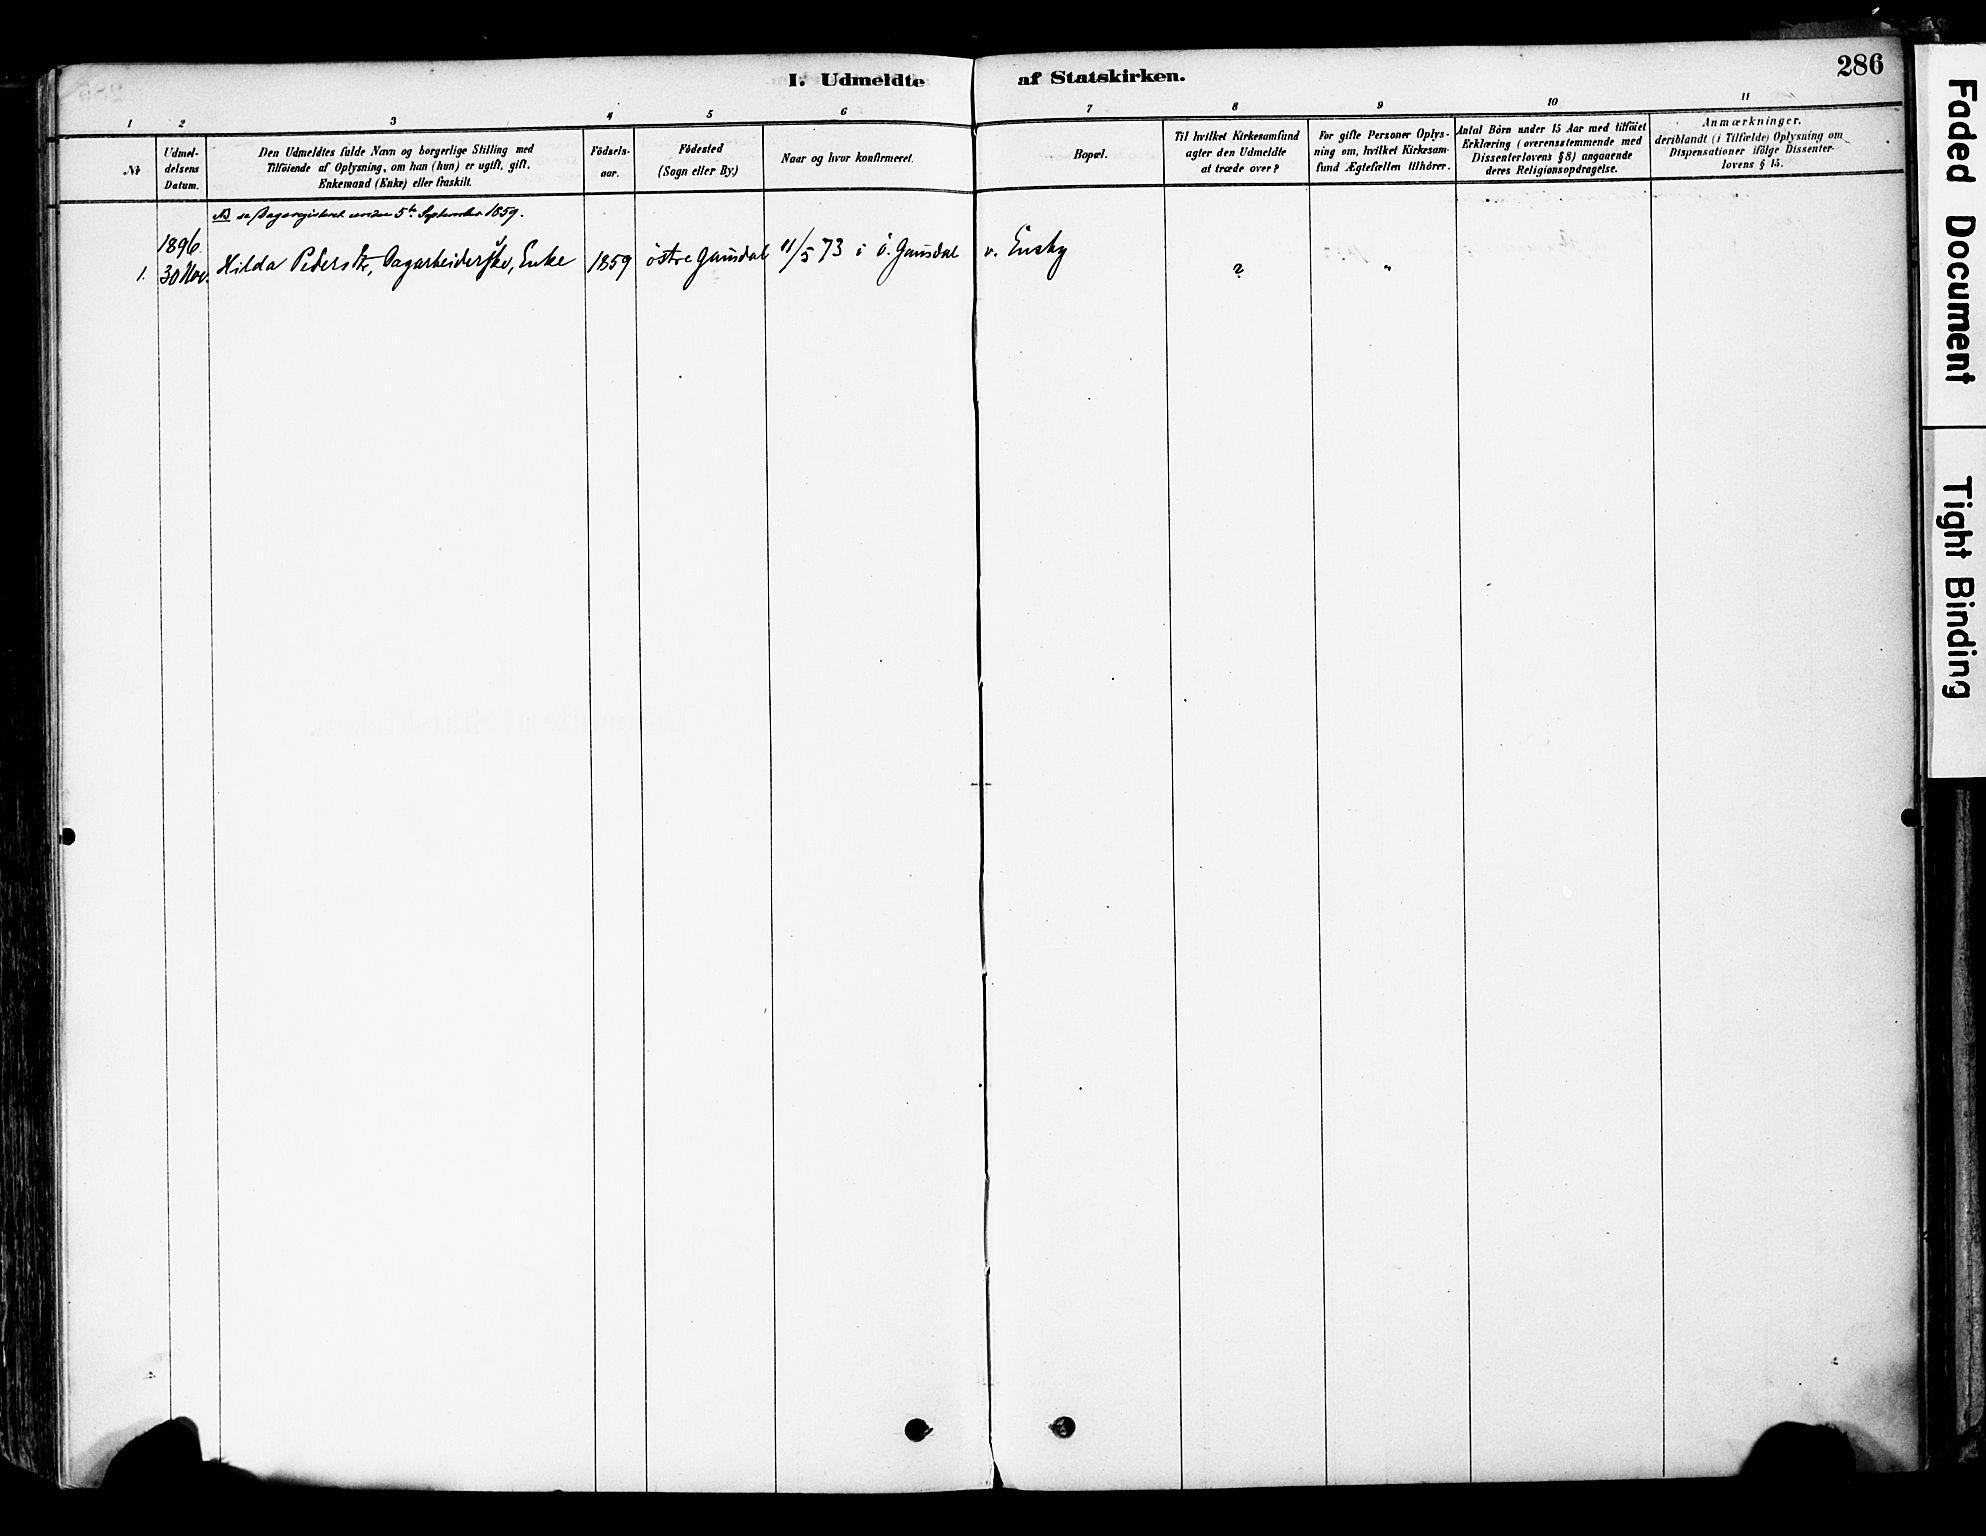 SAH, Øyer prestekontor, Ministerialbok nr. 8, 1878-1897, s. 286